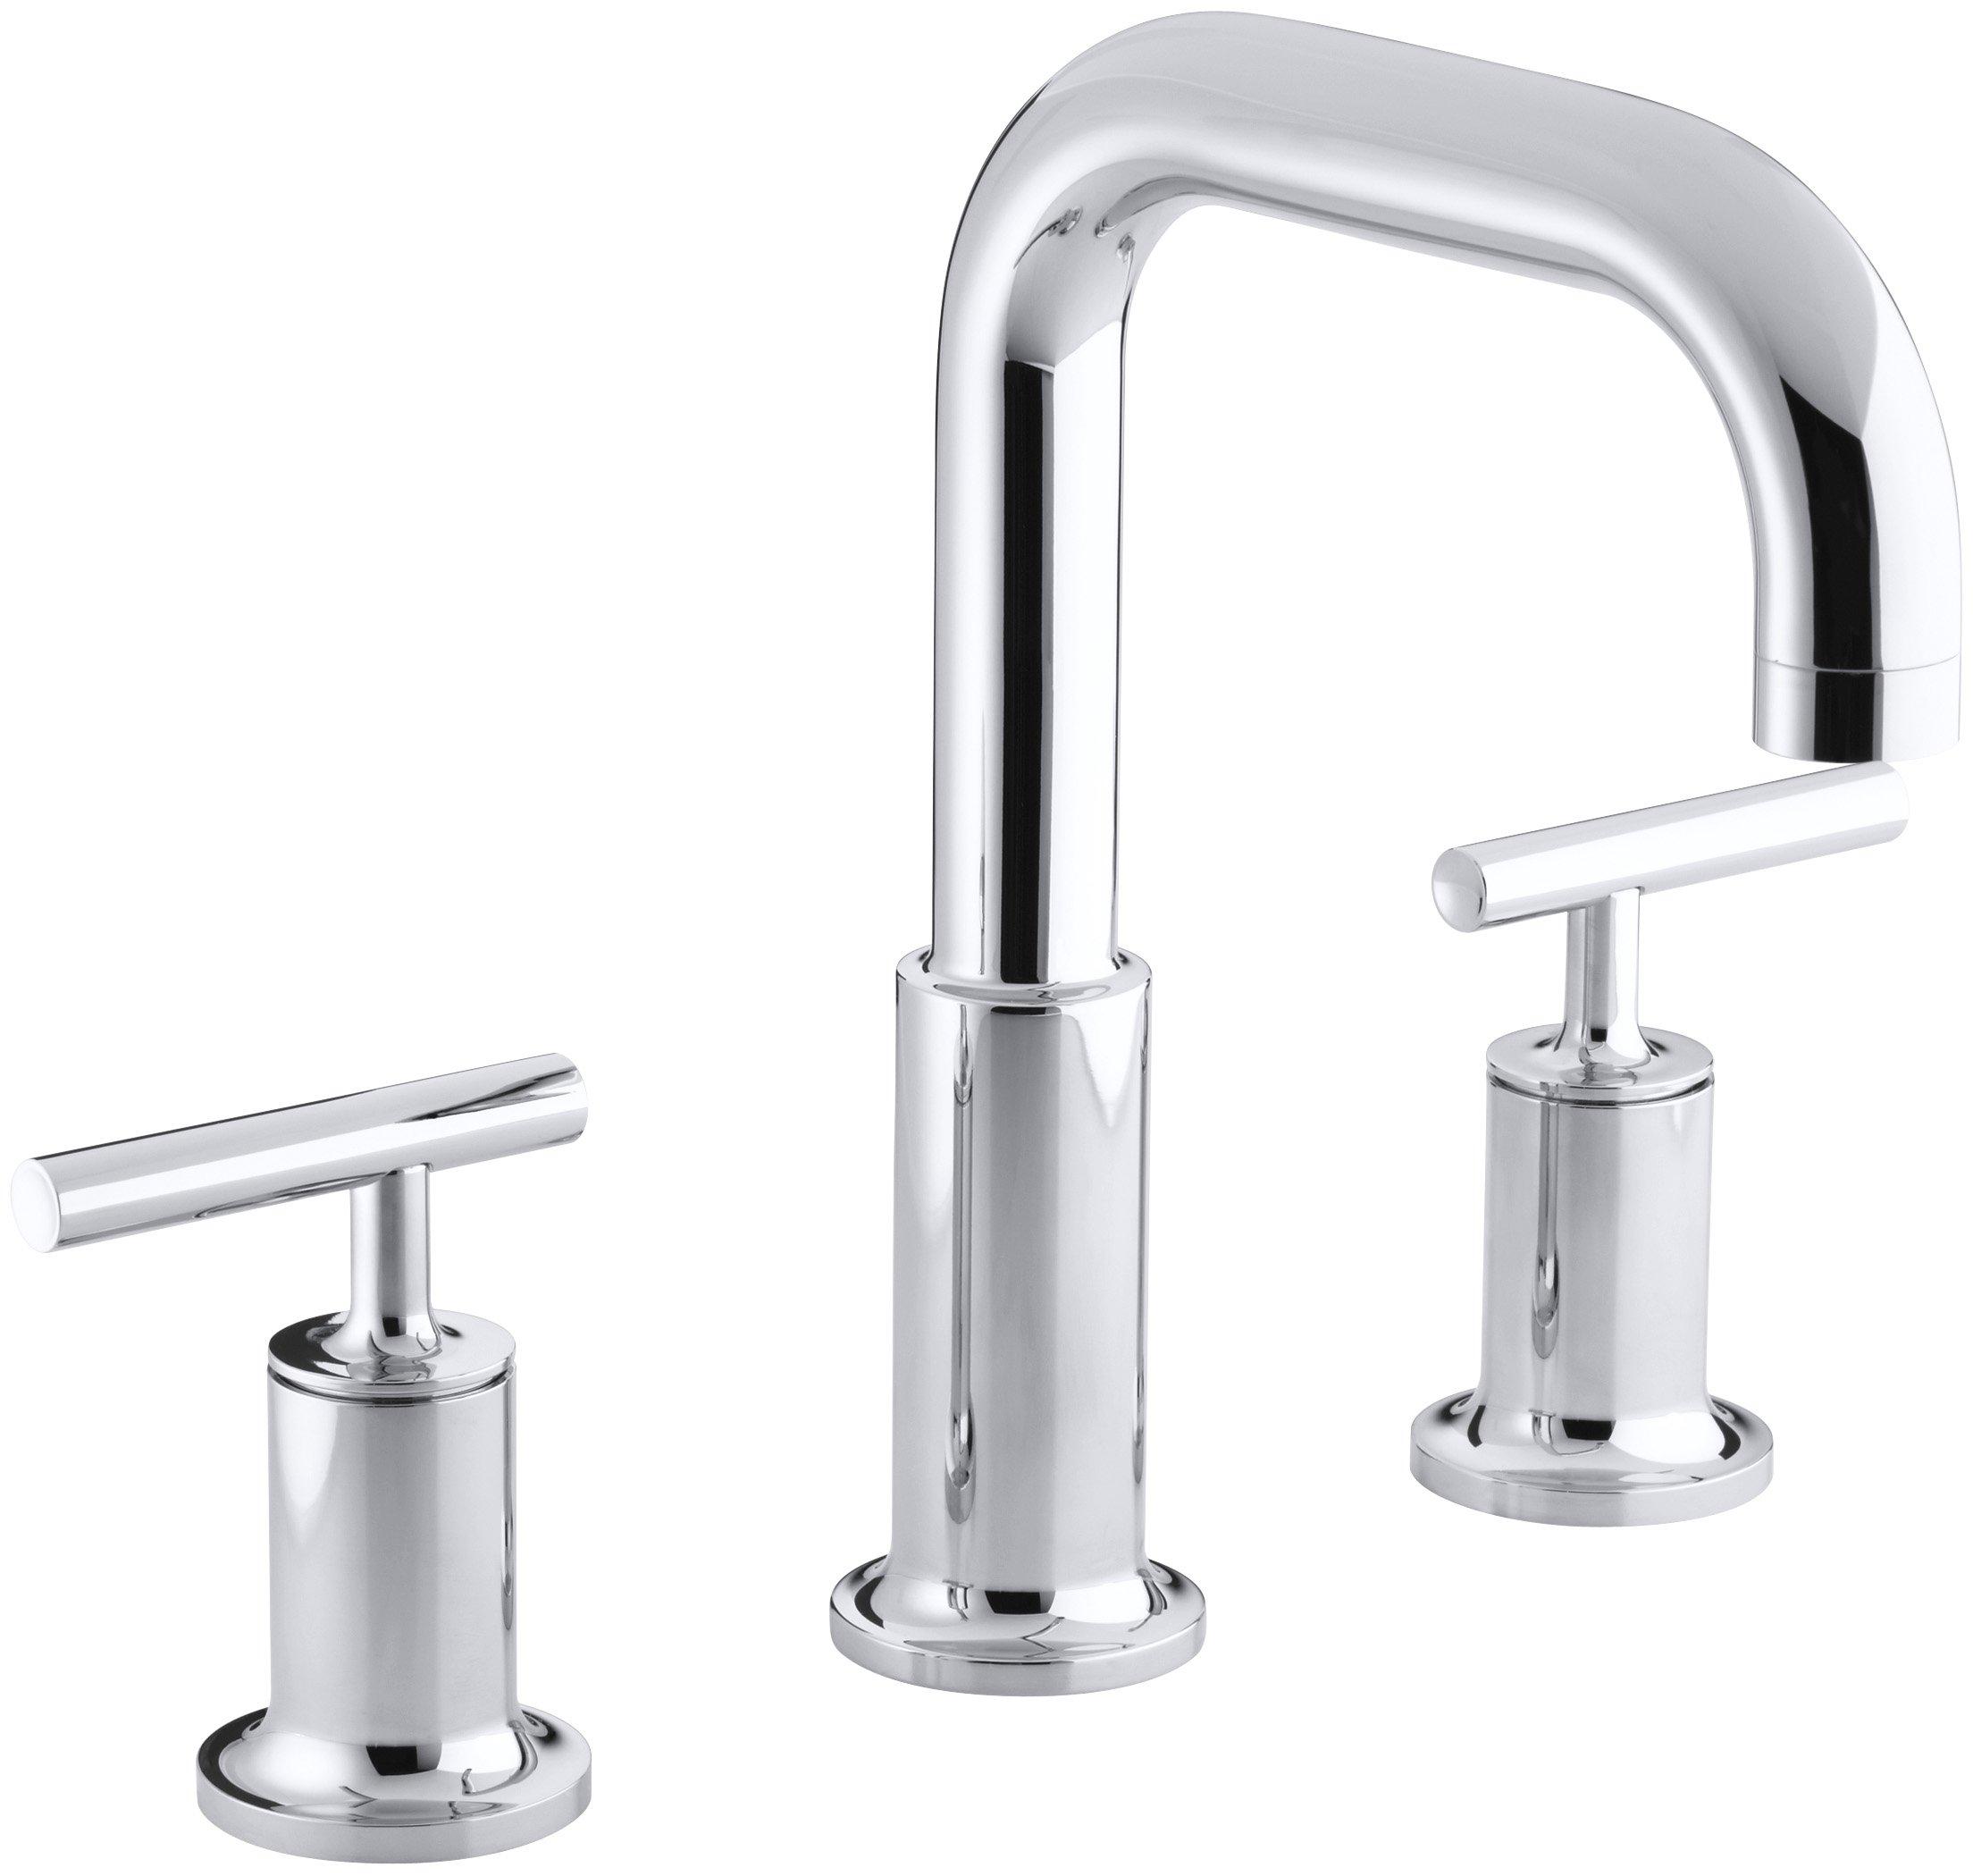 KOHLER K-T14428-4-CP Purist Bath- or Deck-Mount High-Flow Bath Faucet Trim, Polished Chrome by Kohler